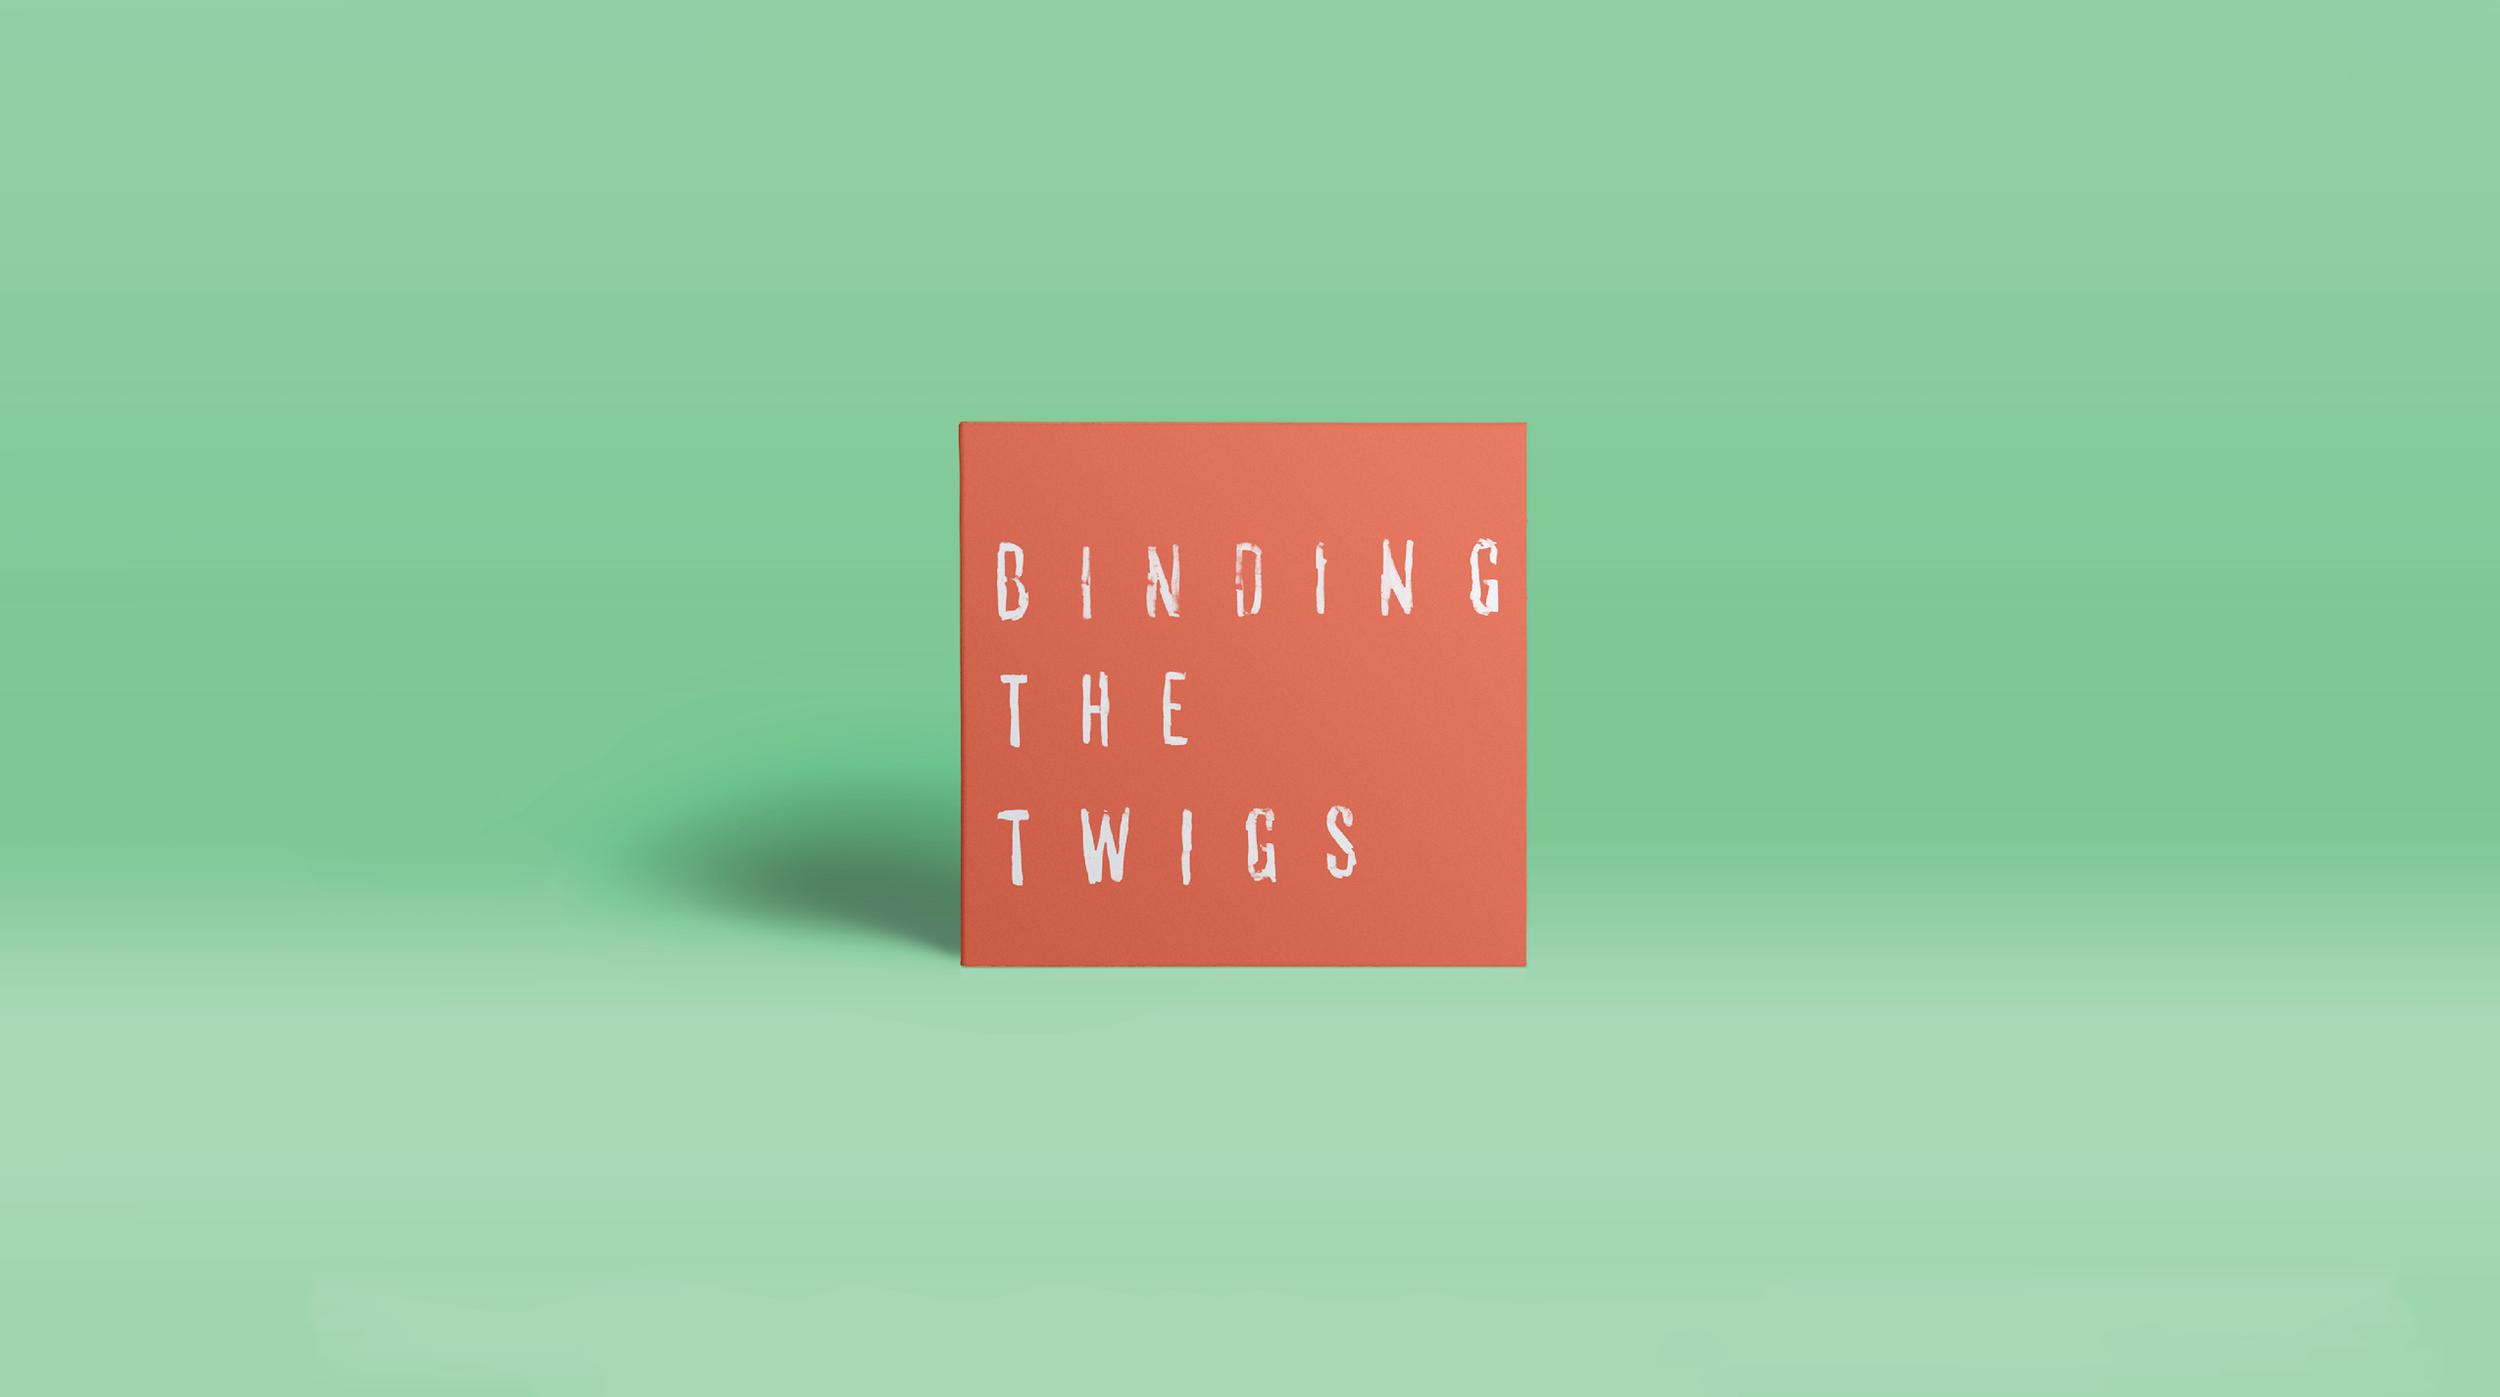 Binding the Twigs: Typography & Design